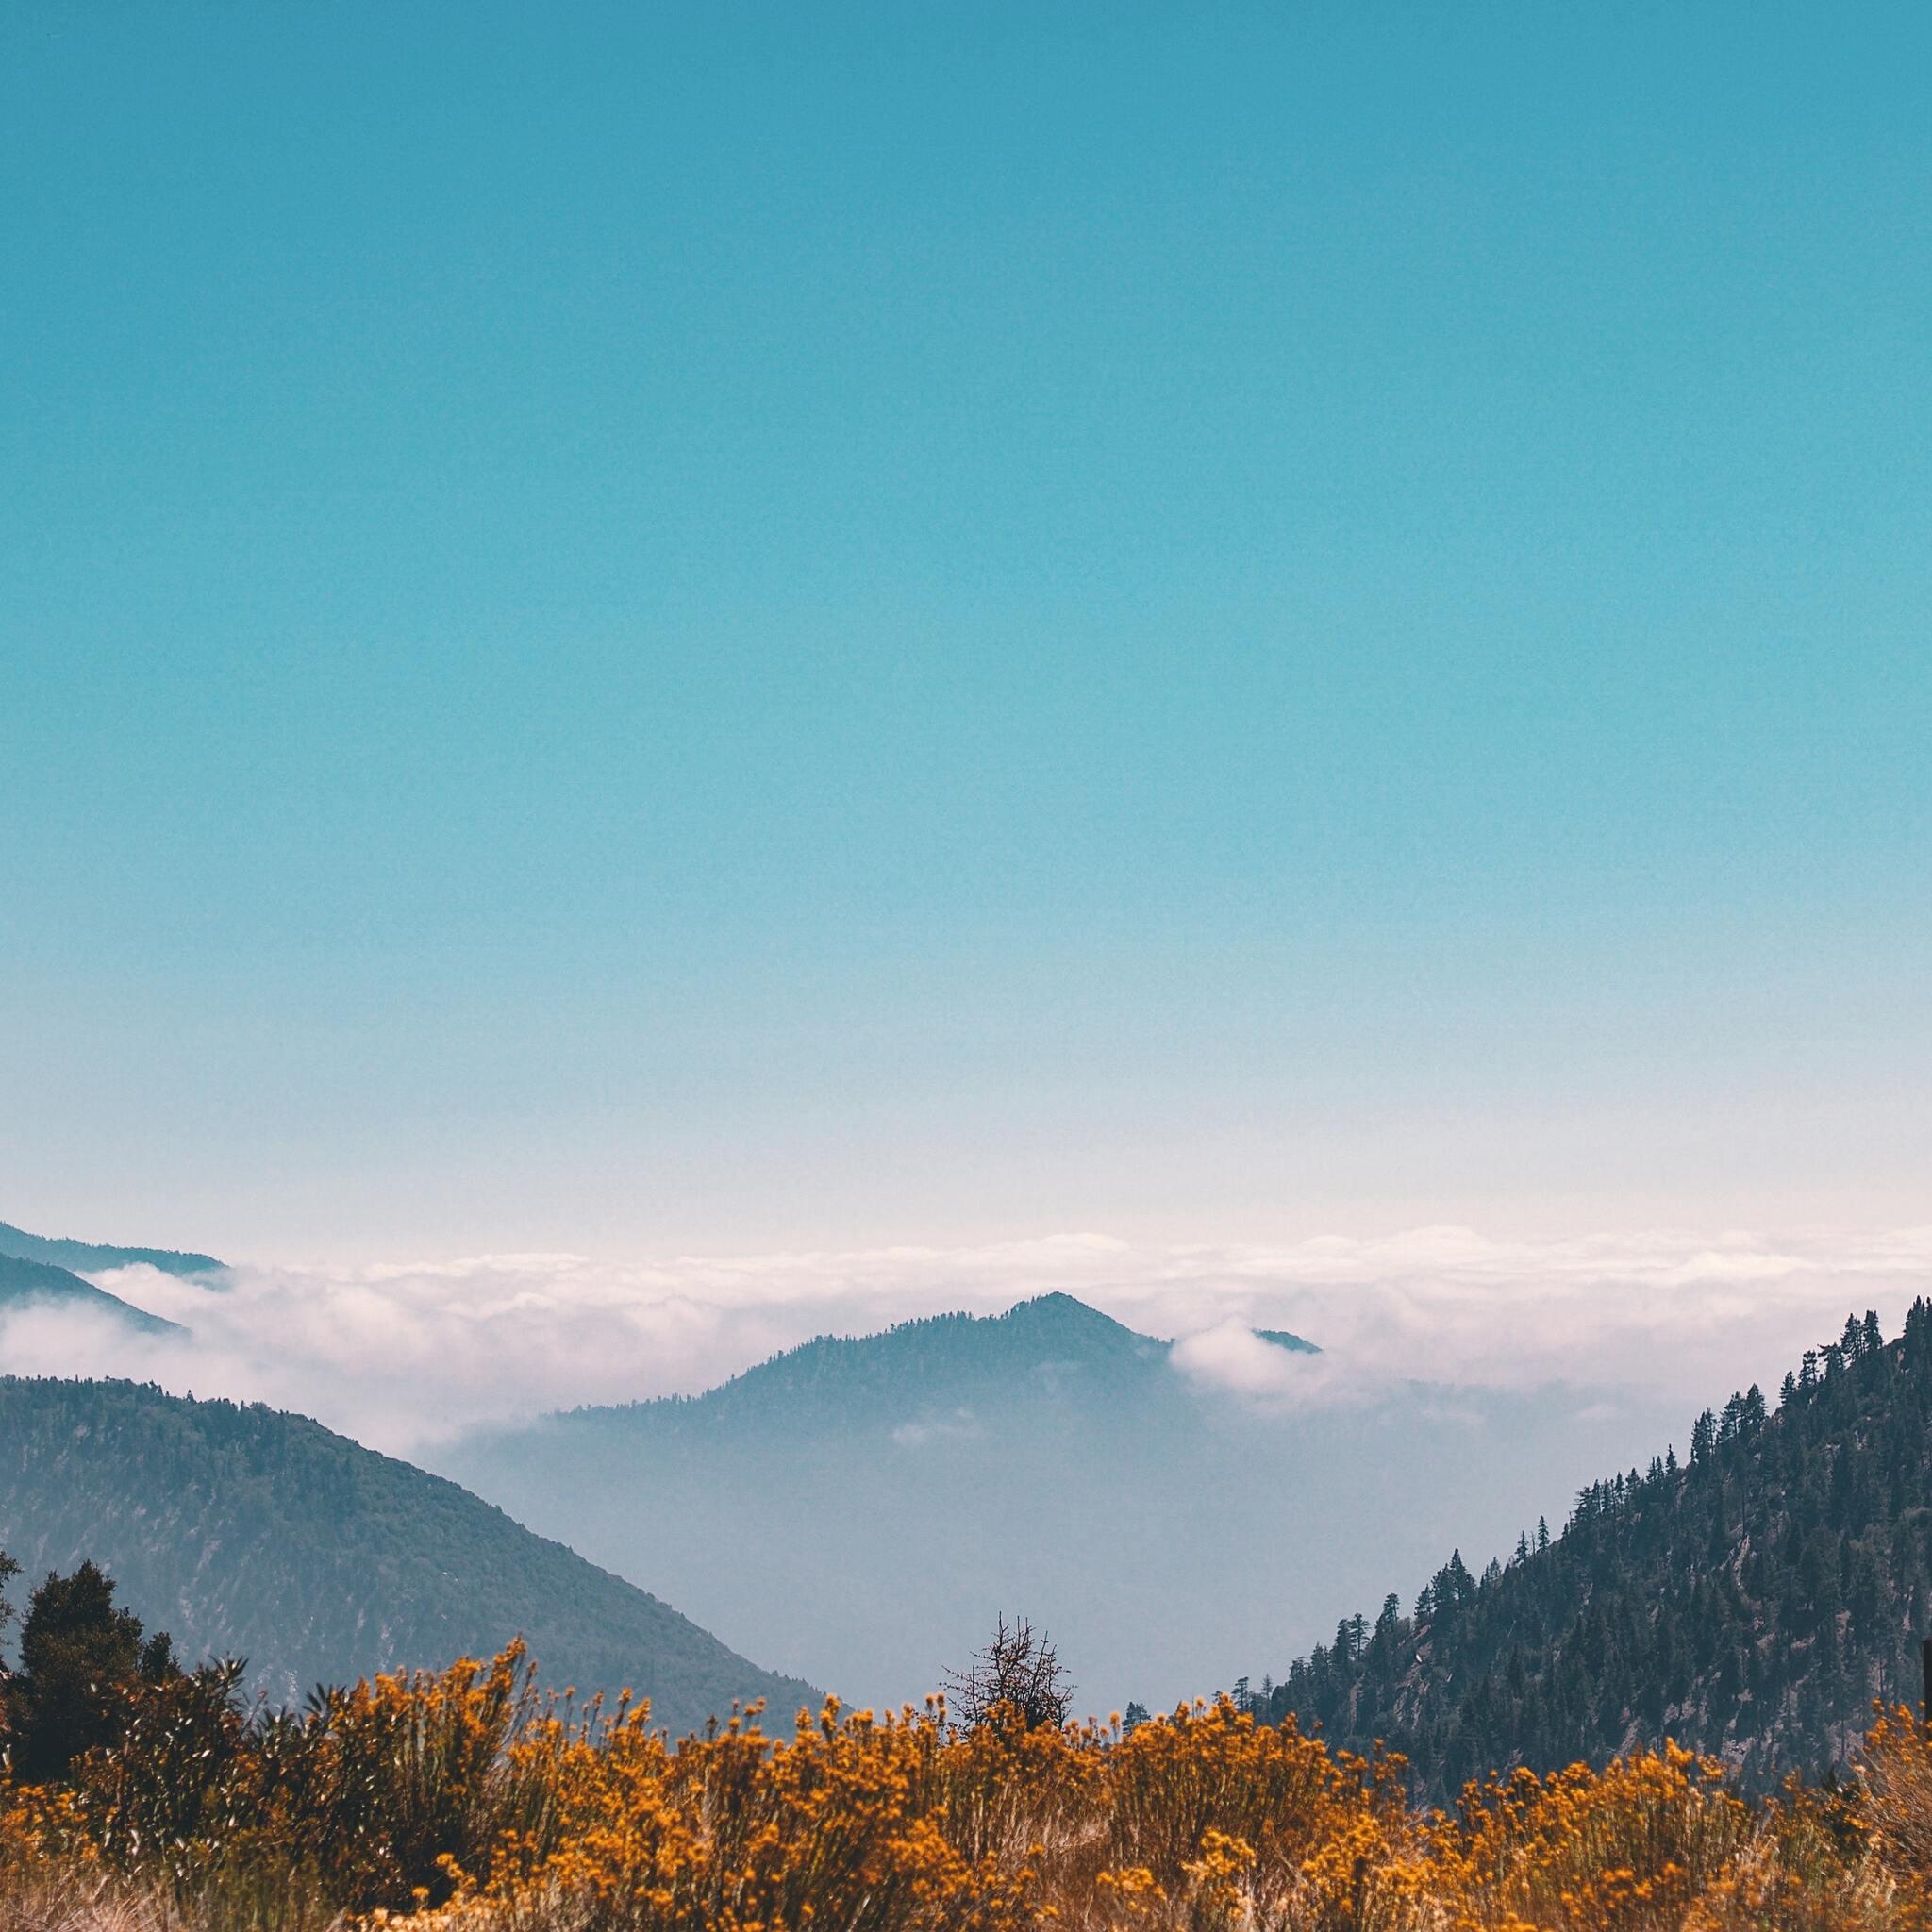 2048x2048 Beautiful Landscape Mountains 4k Ipad Air Hd 4k